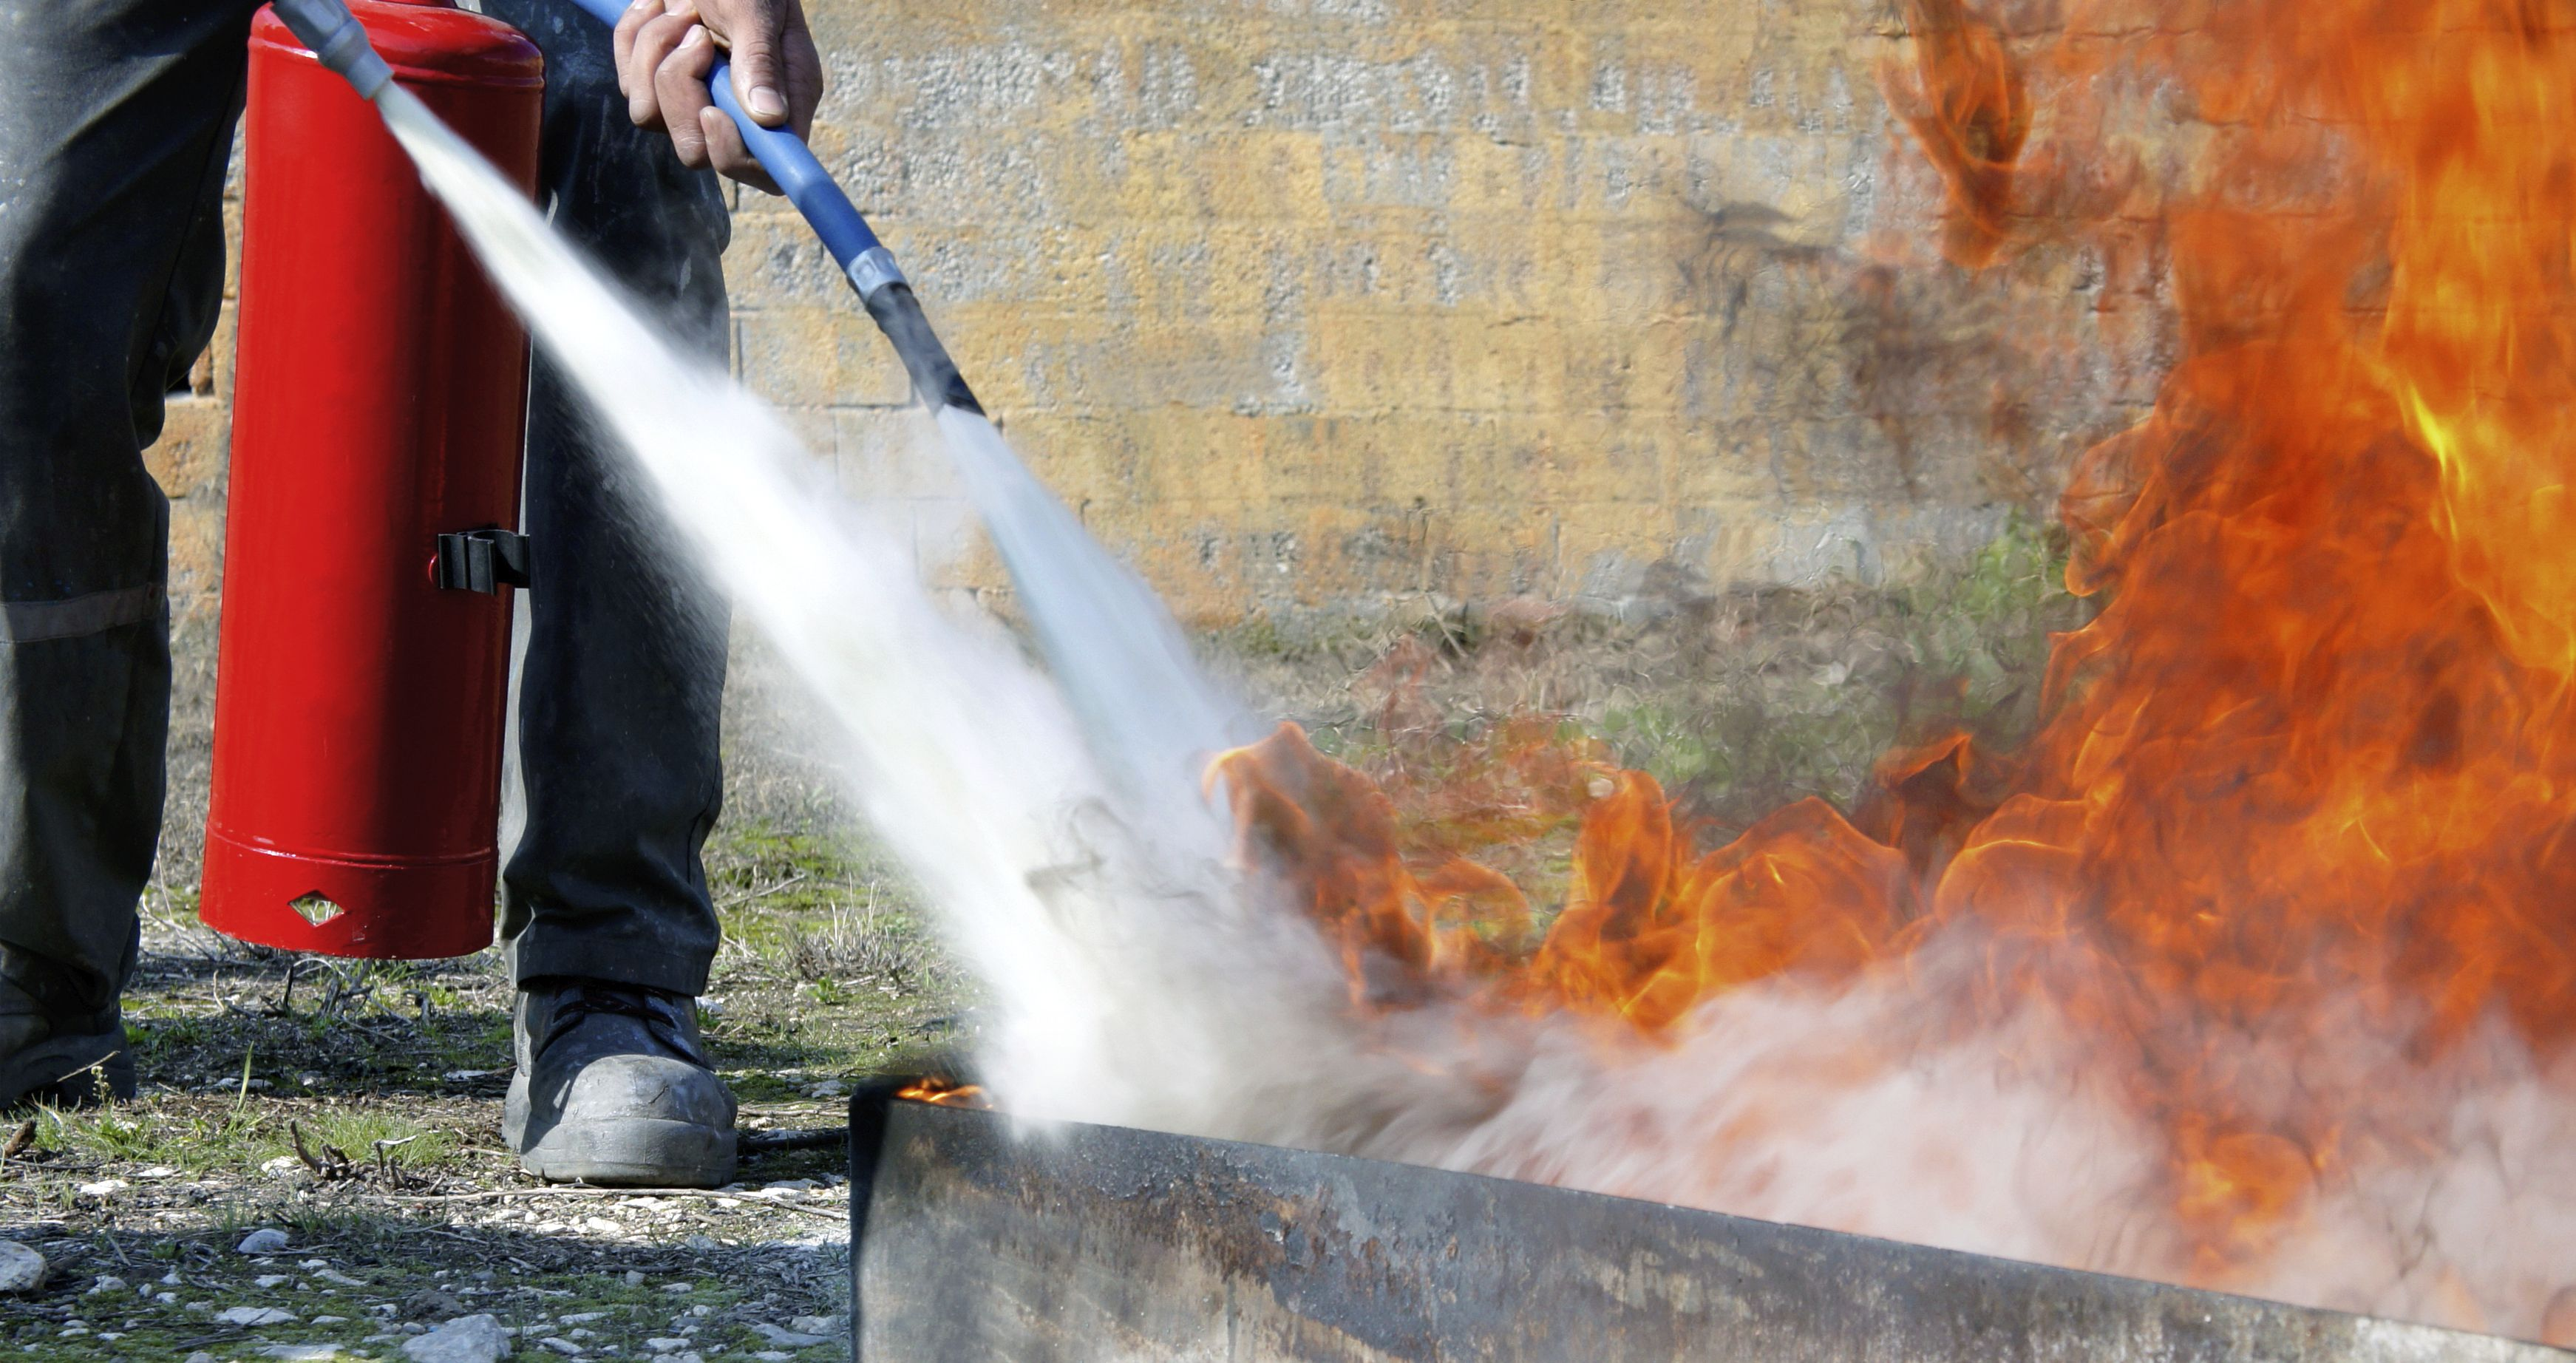 Extintores con diversos tipos de polvo